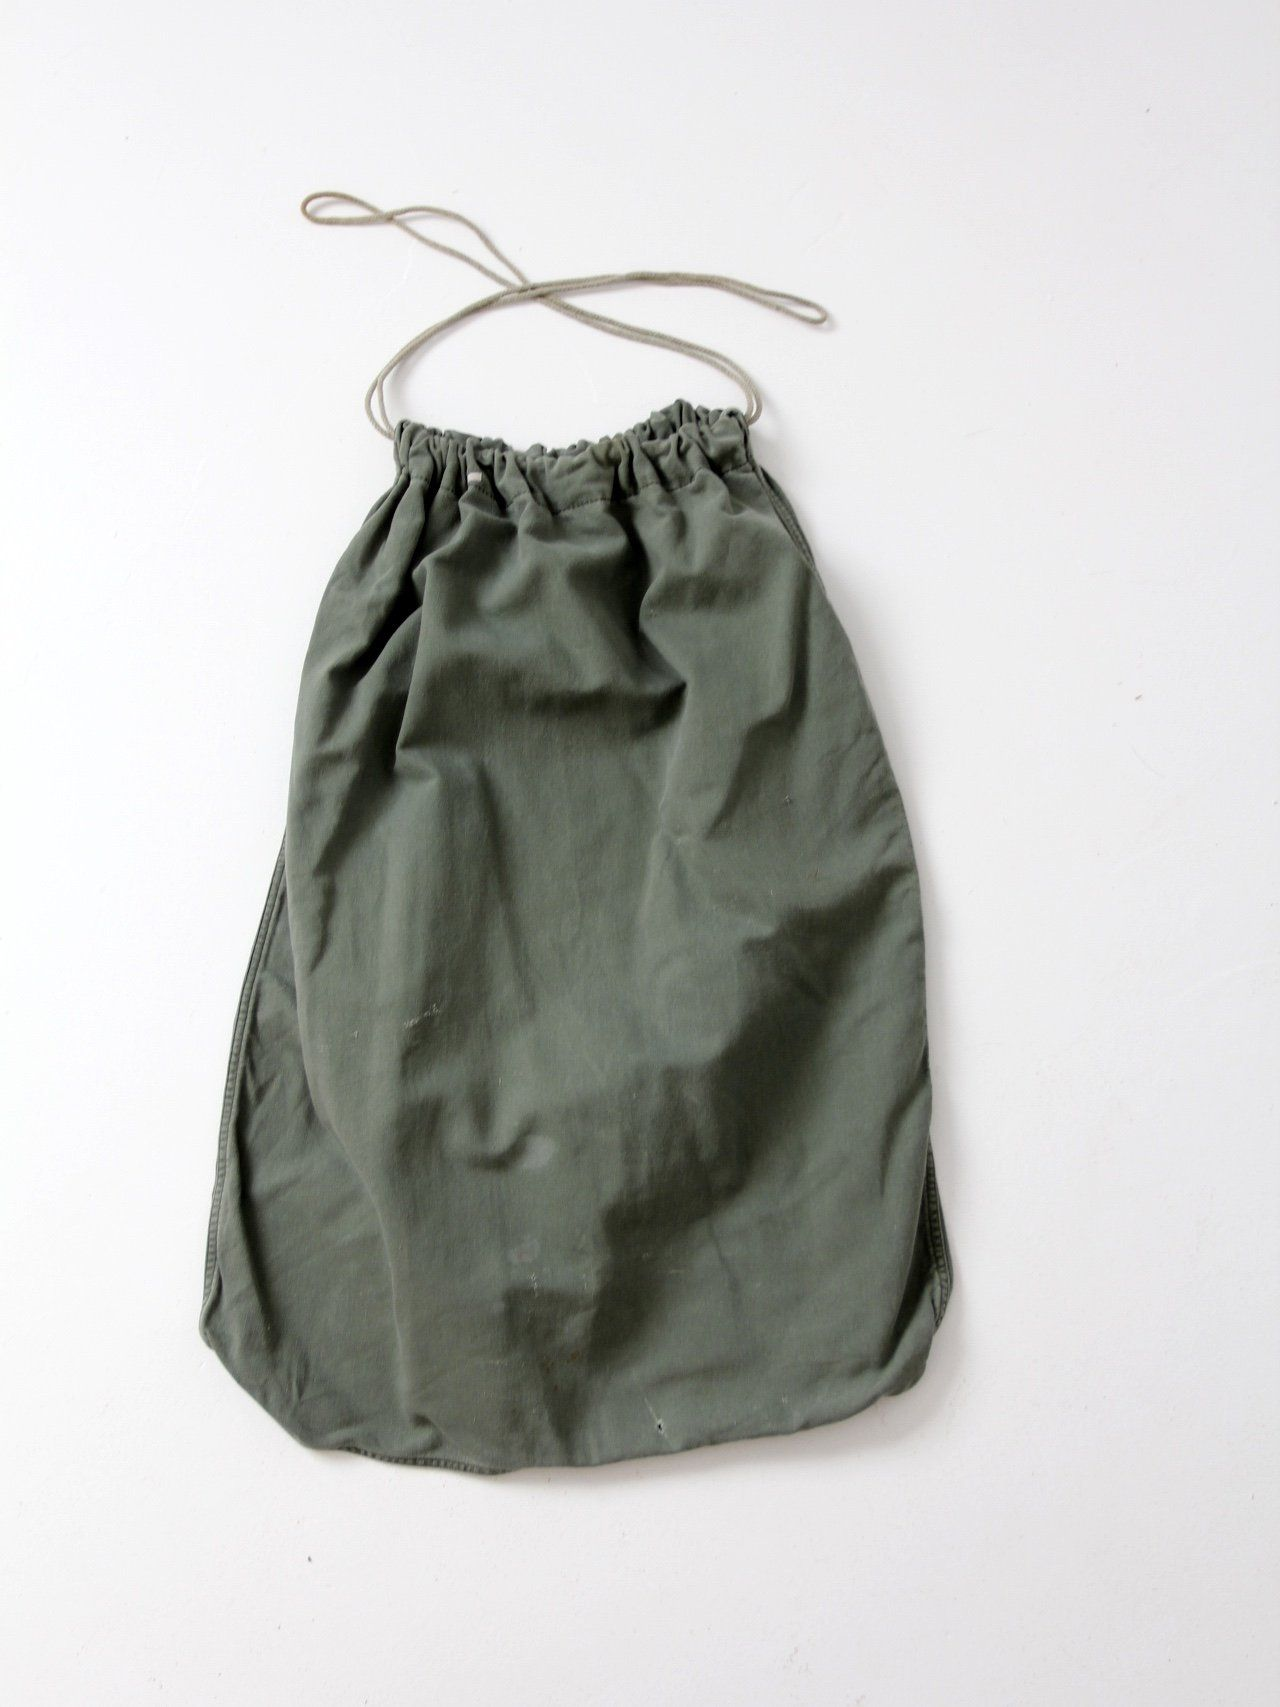 Vintage U S Army Drawstring Bag Bags Vintage Canvas Laundry Bag